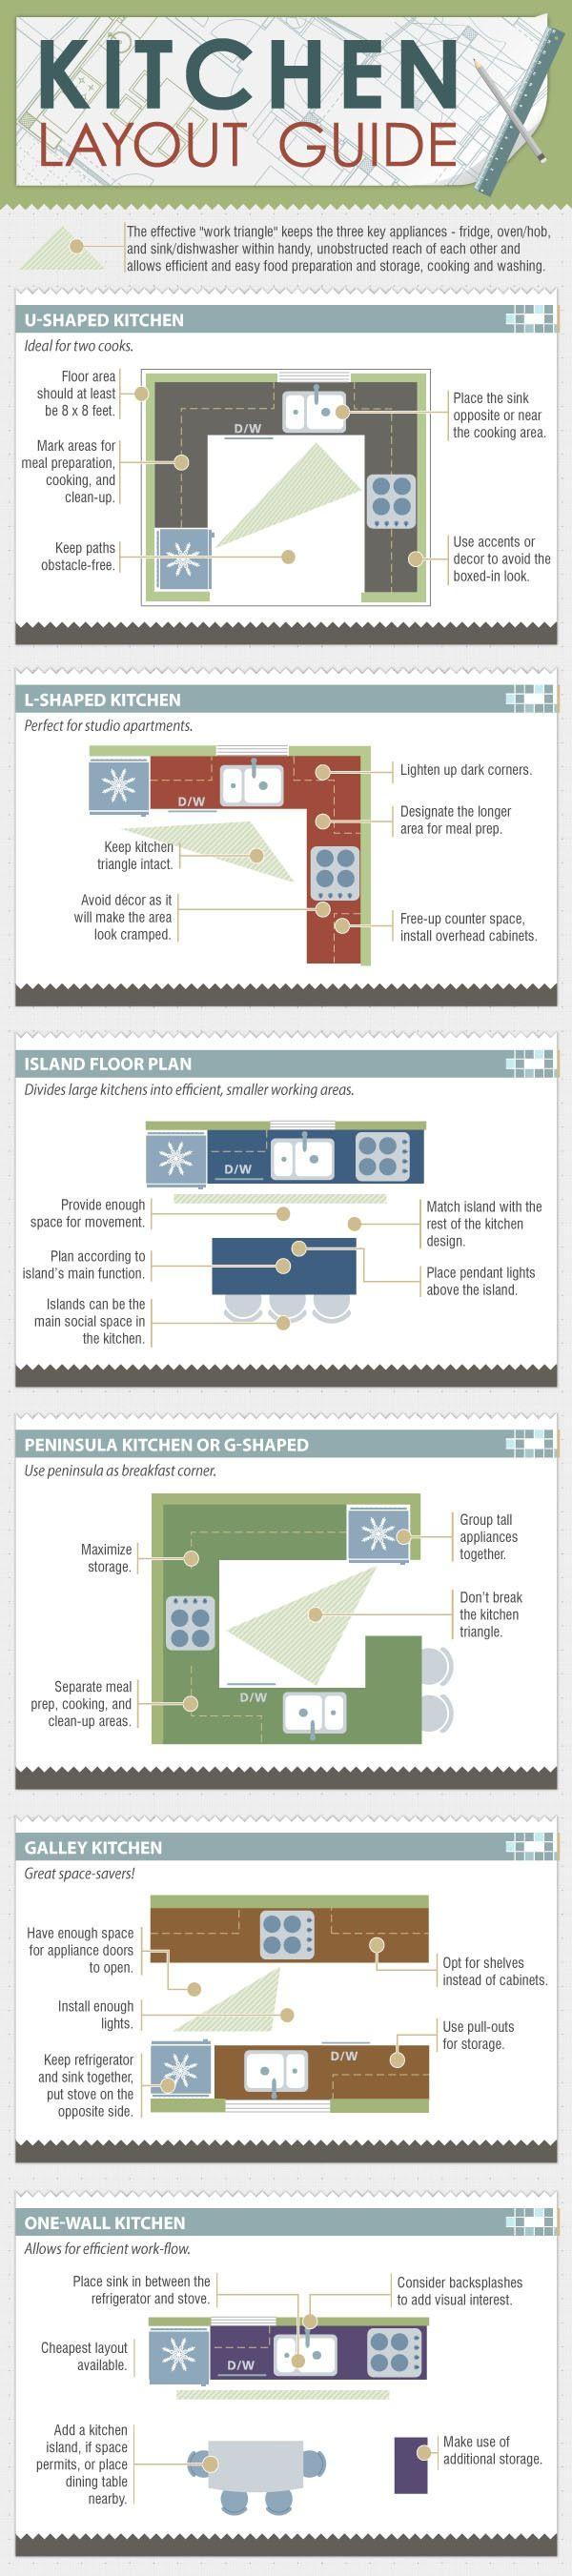 Kitchen Layout Guide | Cool Kitchen Ideas | Pinterest | Layouts